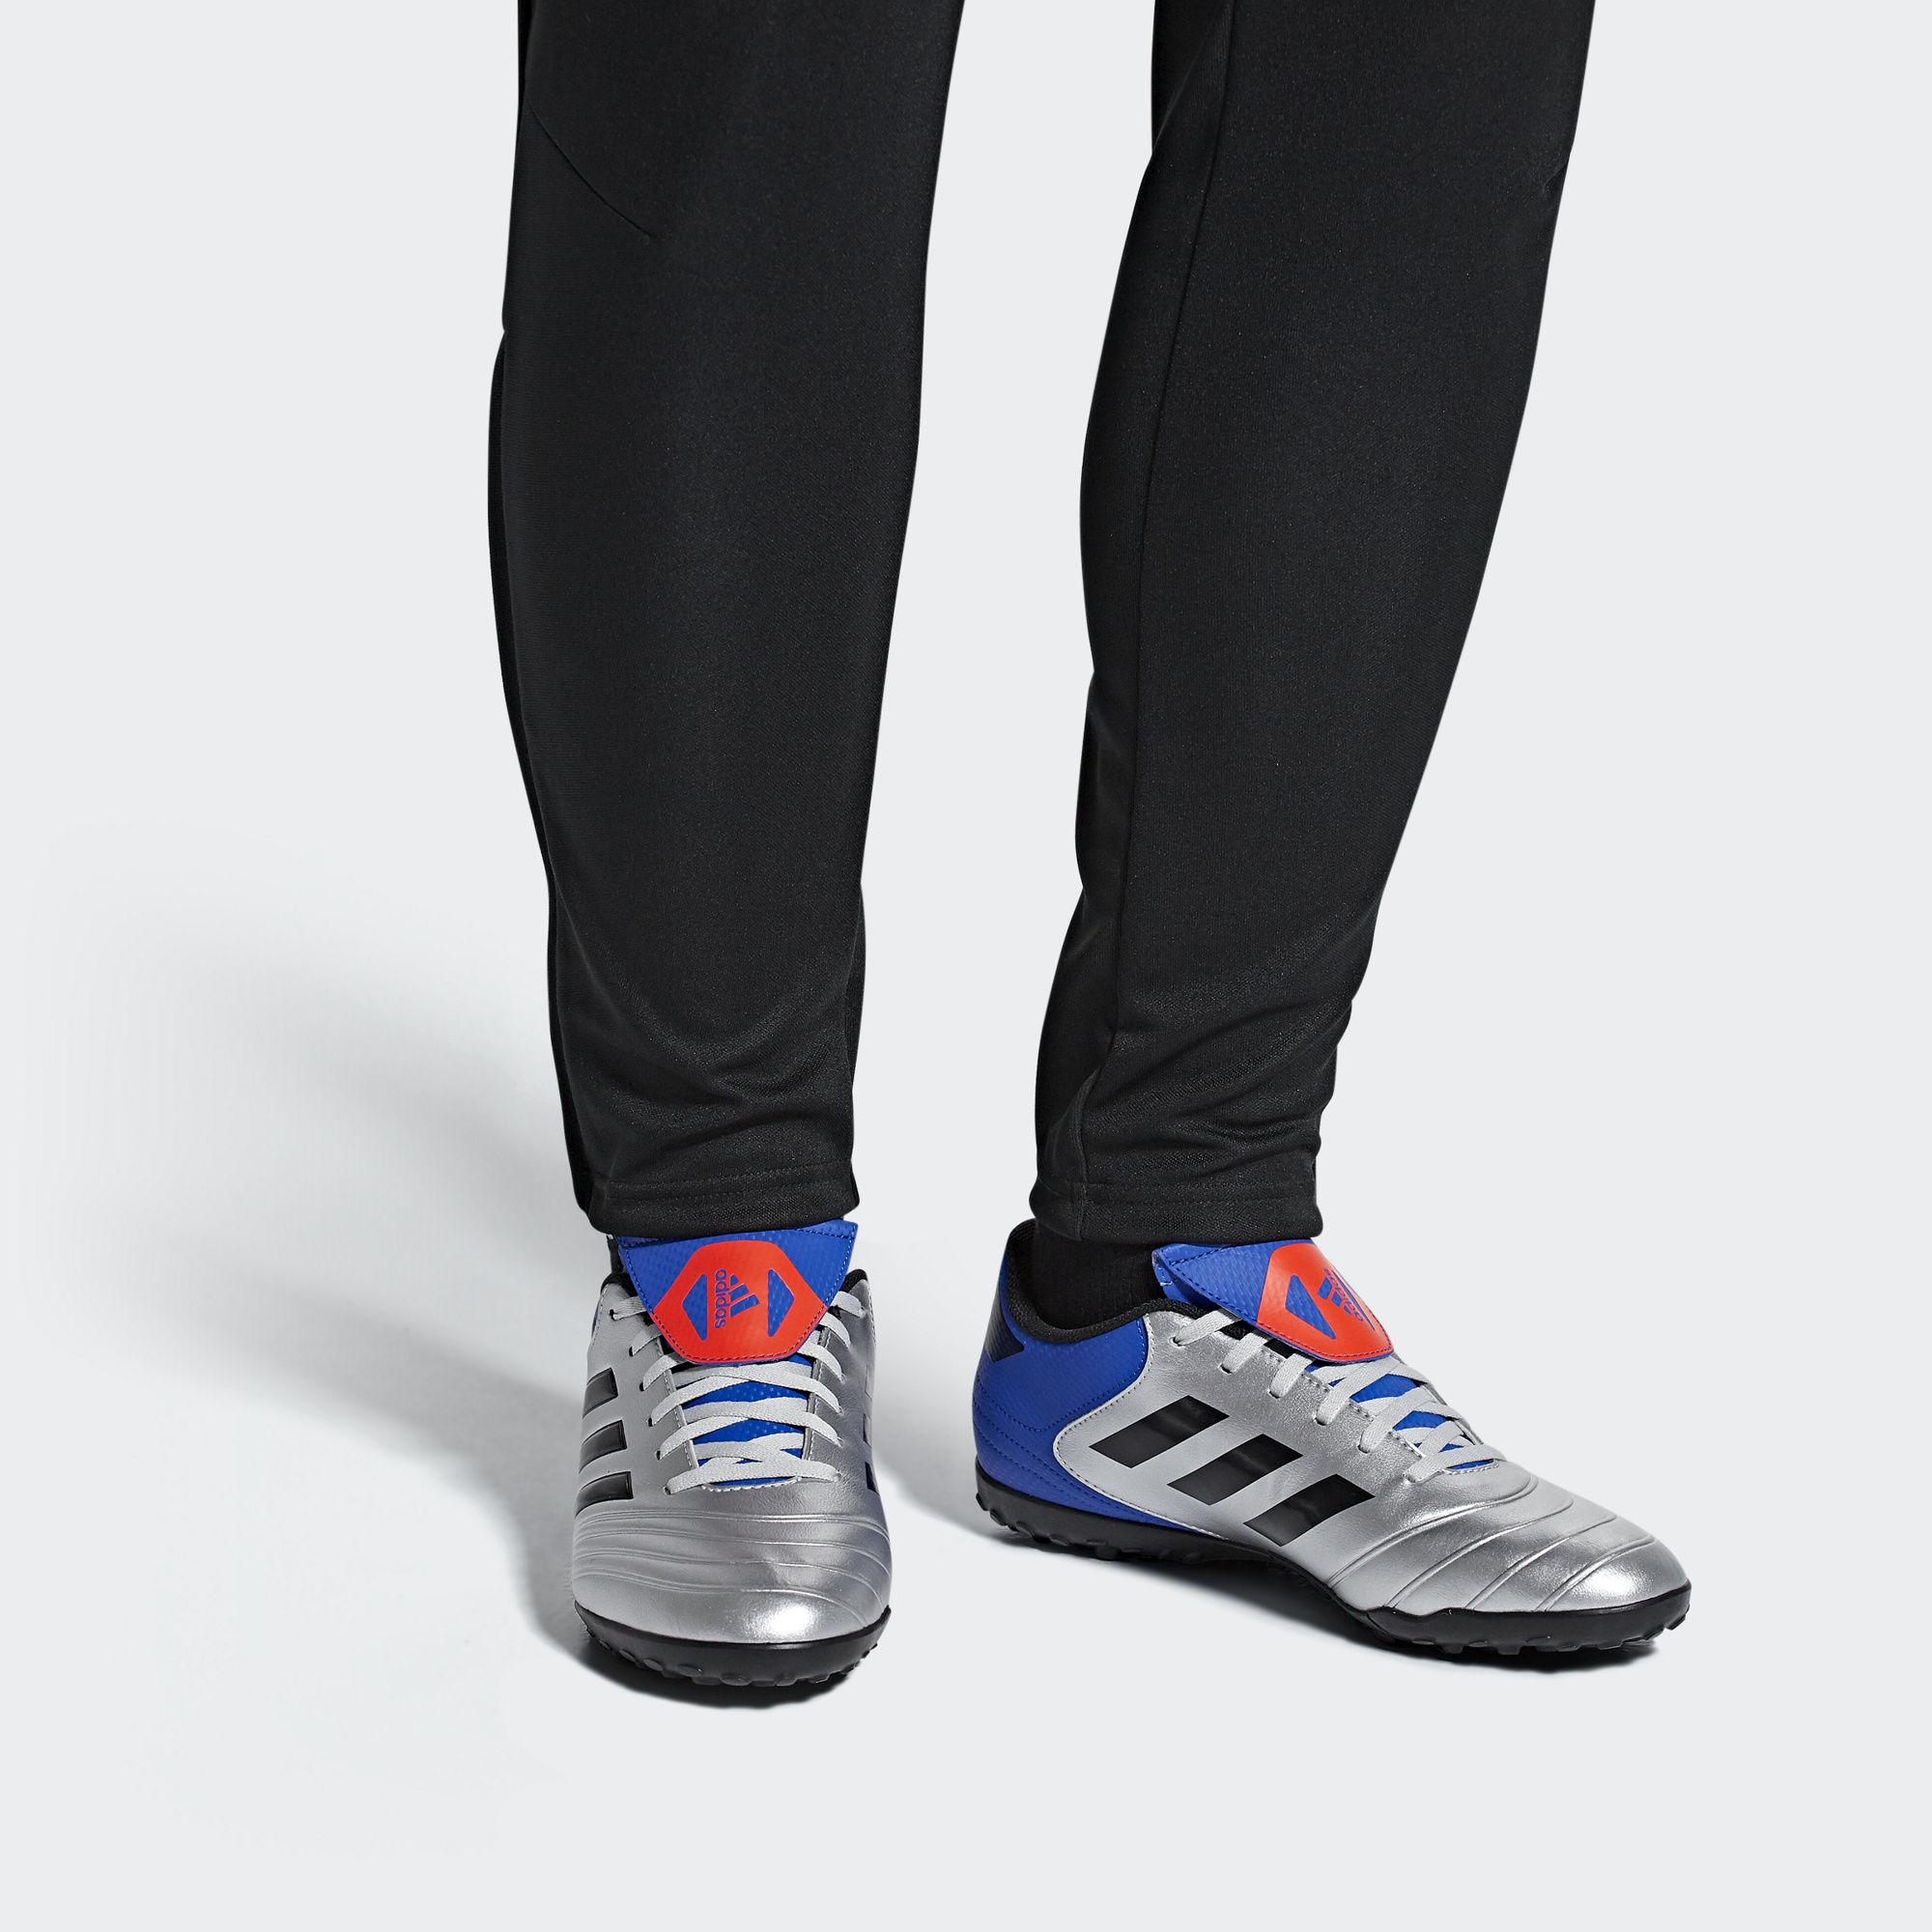 Football-shoes-Adidas-Scarpe-Calcio-Copa-Tango-18-4-Silver-Calcetto-Turf-2018 miniatura 5